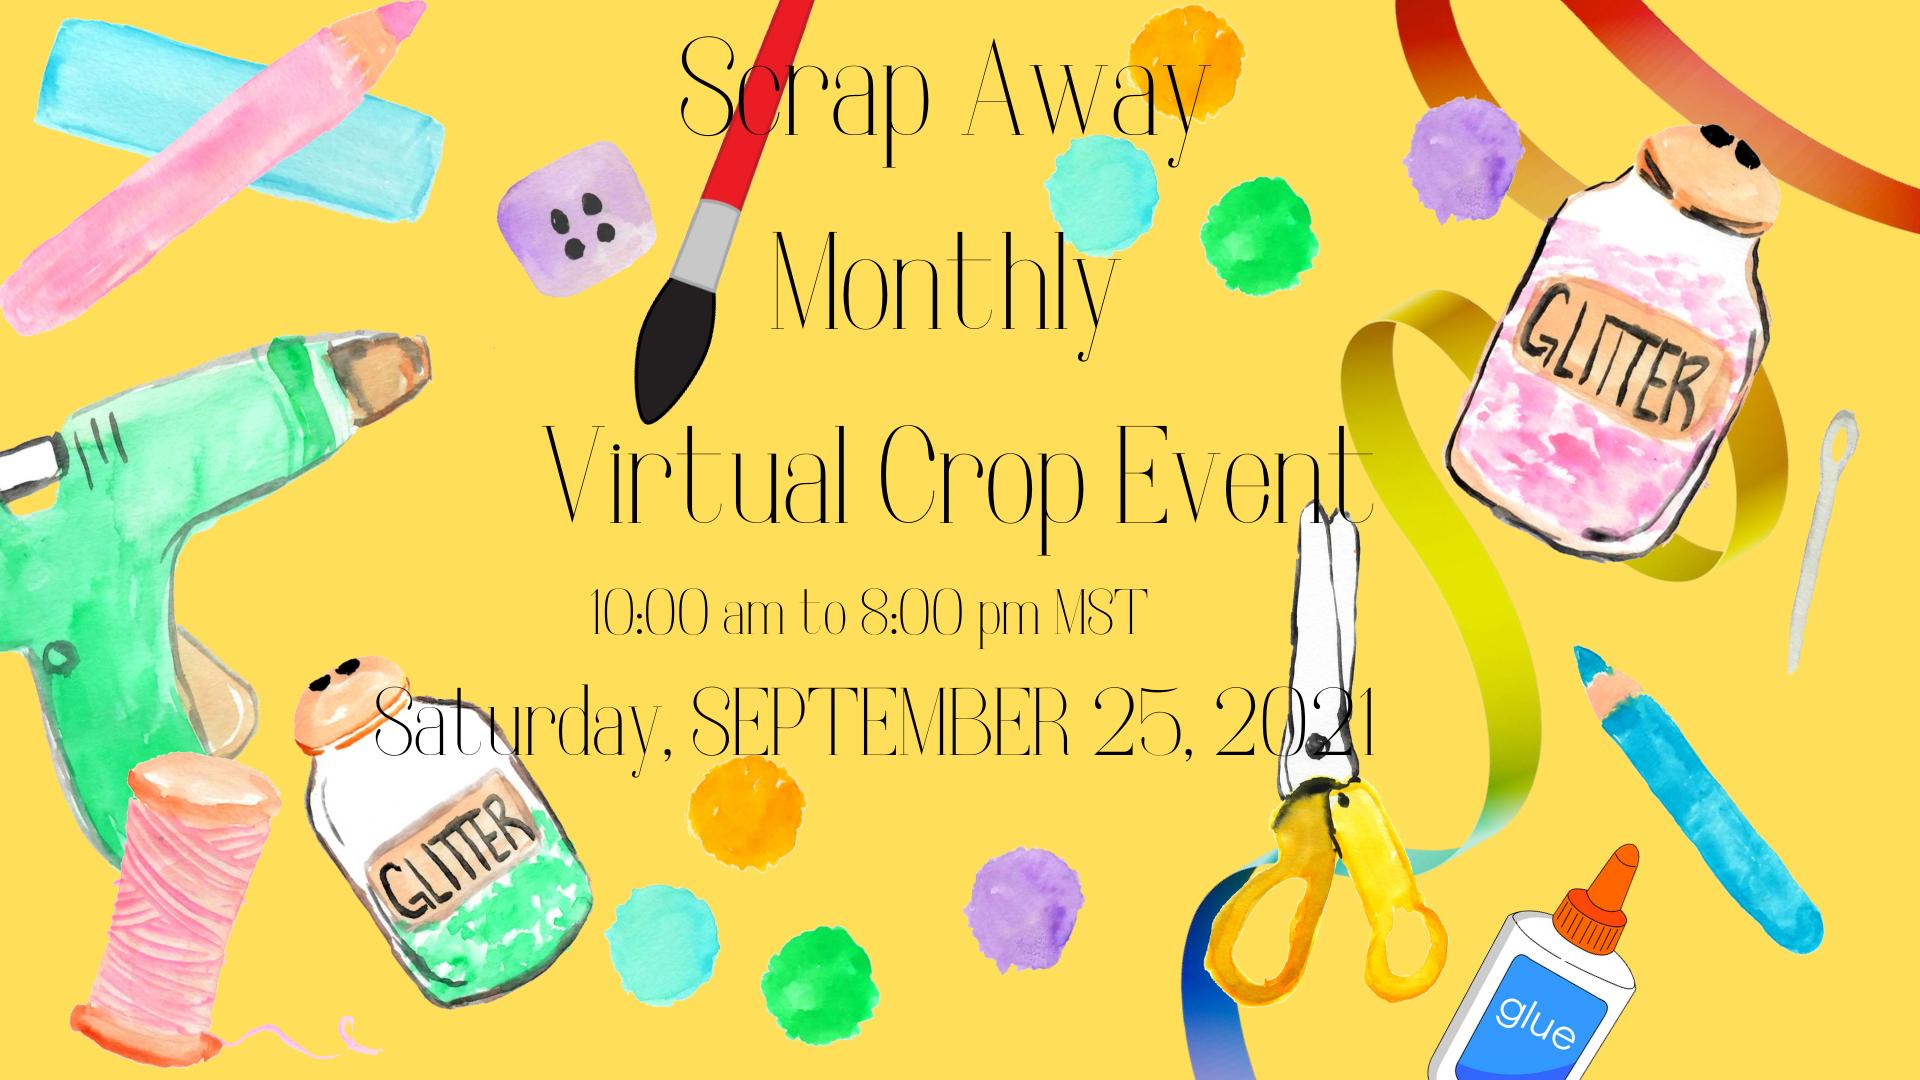 SCRAP AWAY MONTHLY VIRTUAL CROP EVENT – SEPTEMBER